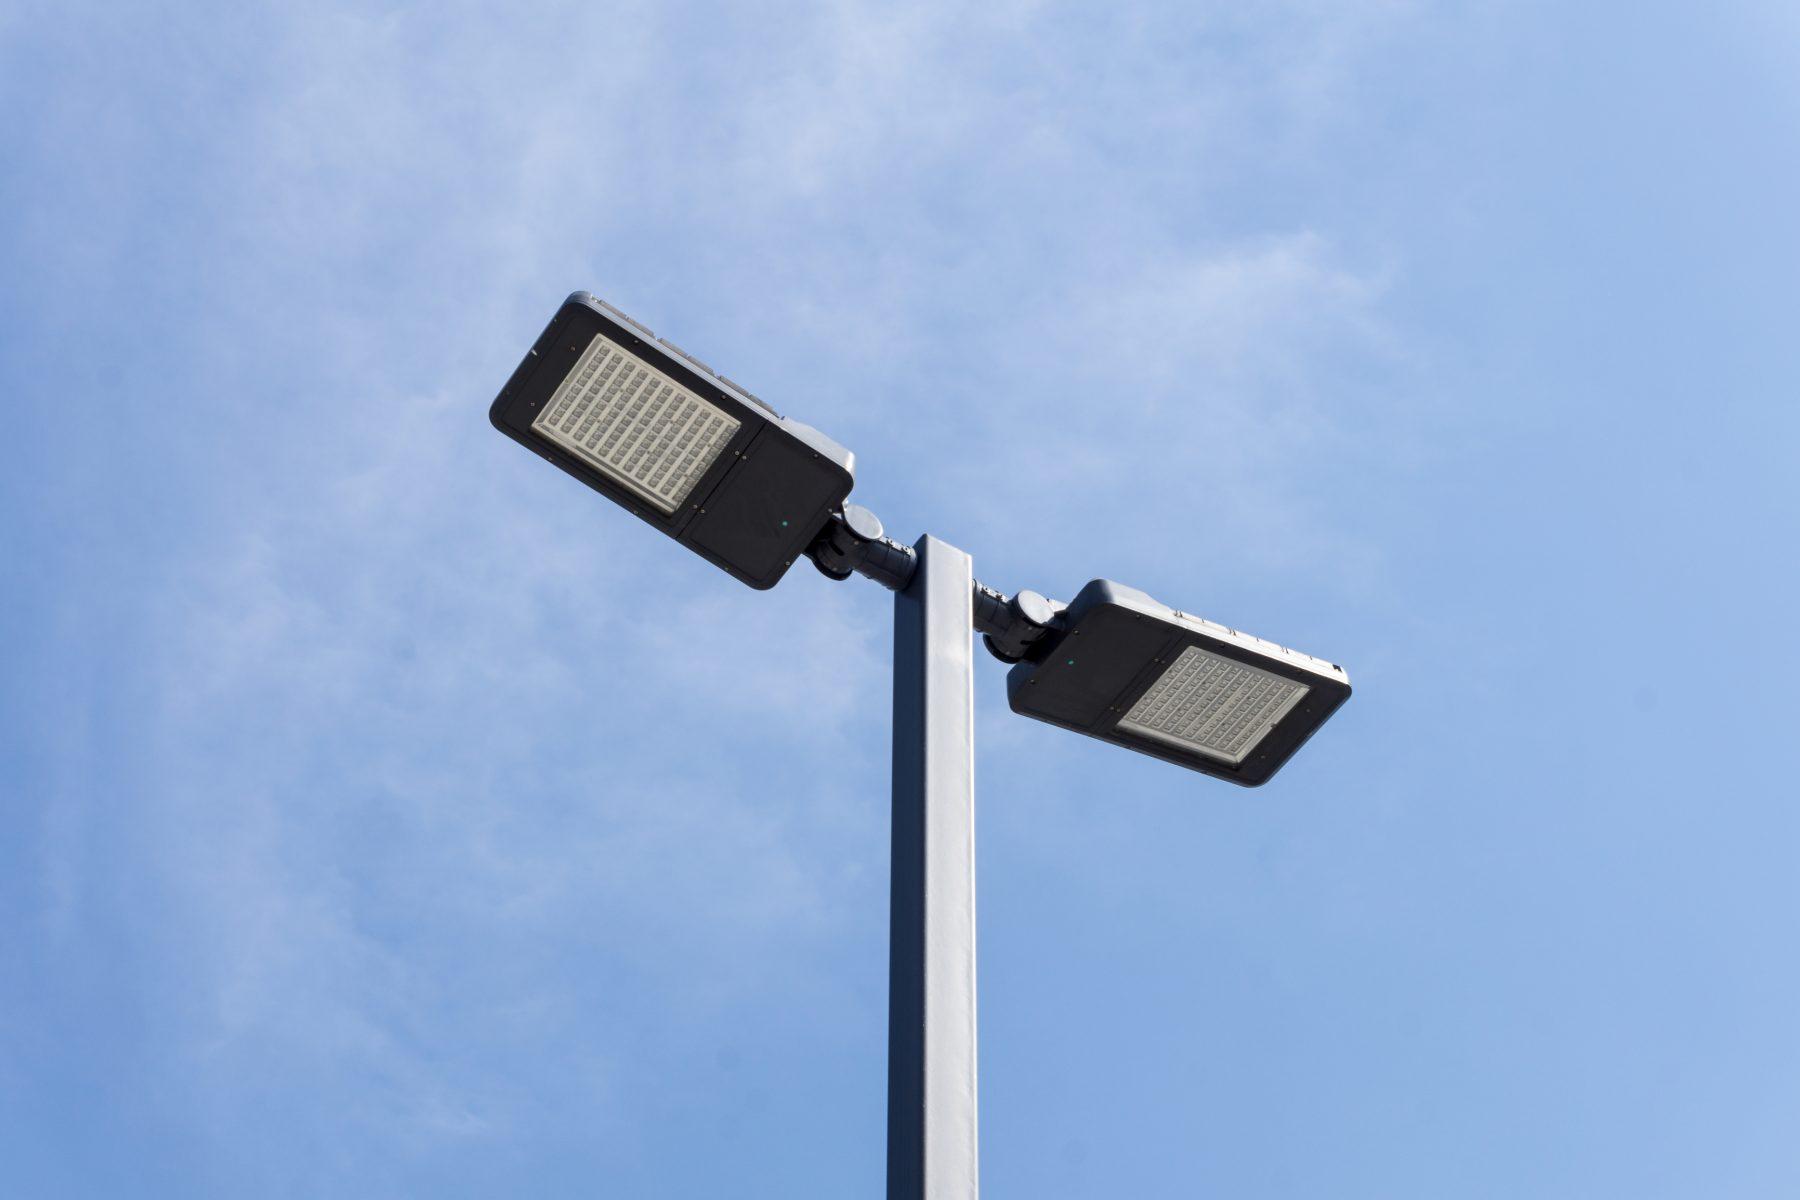 Energywise LED Street Lights